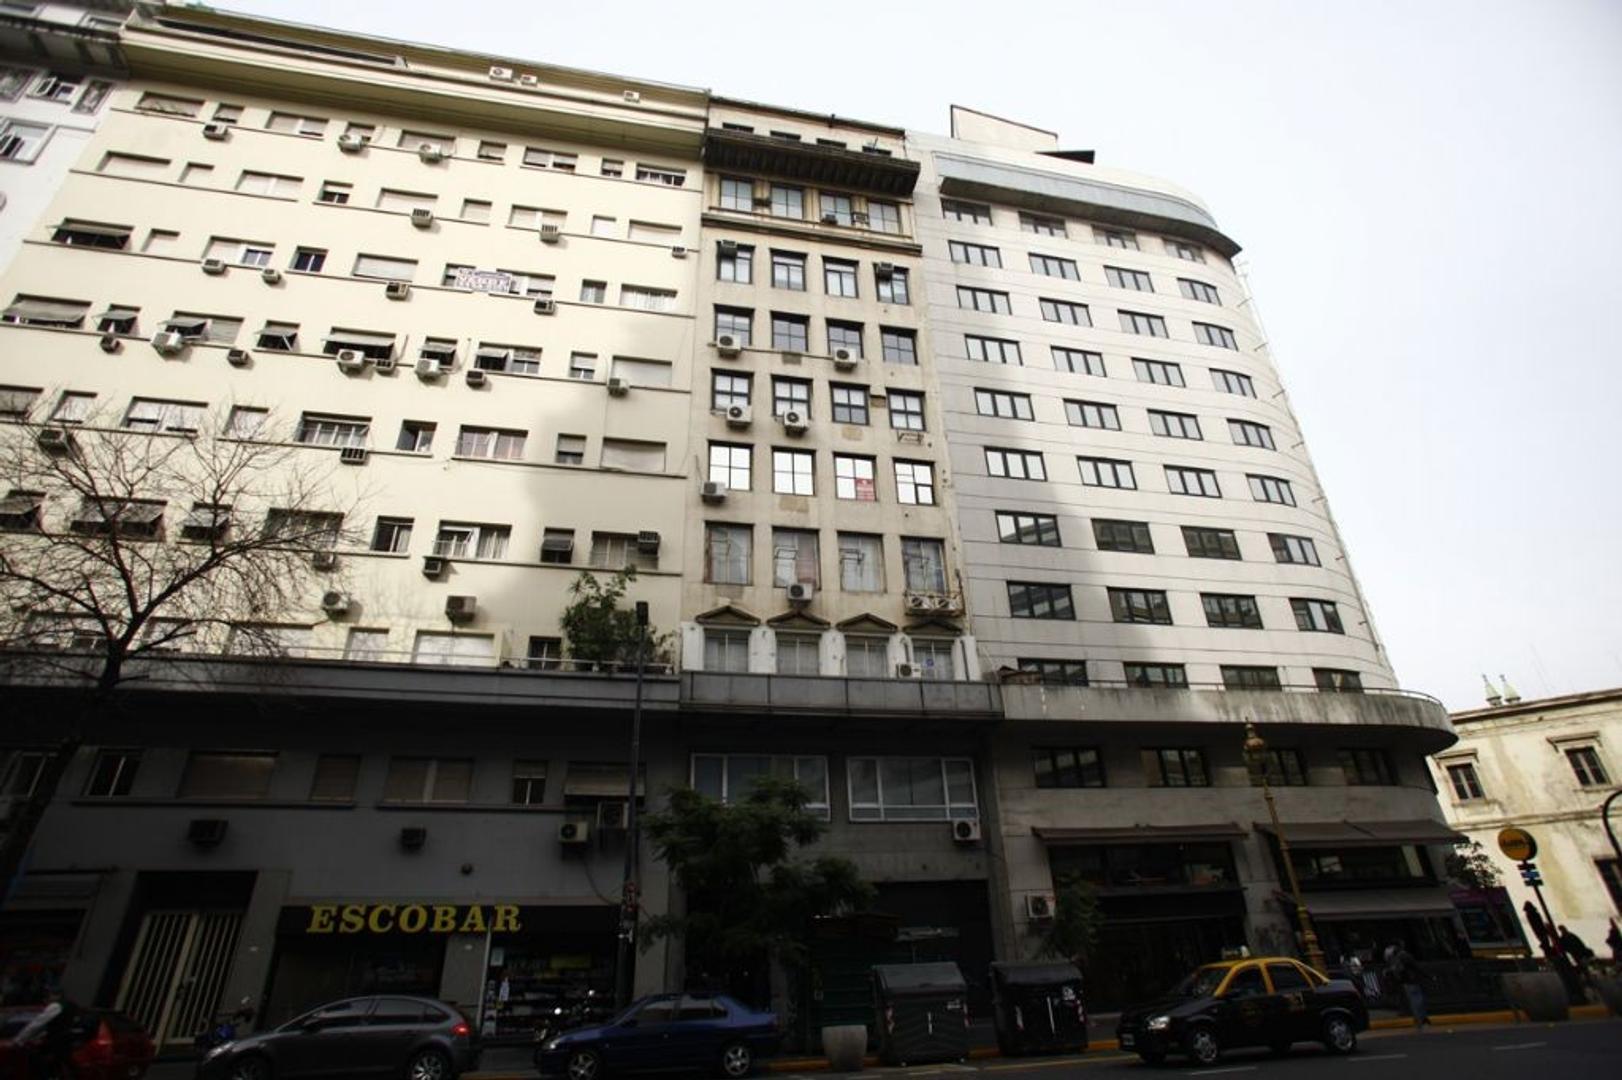 Oficina  en Venta ubicado en Centro, Capital Federal - ALT0017_LP111769_2